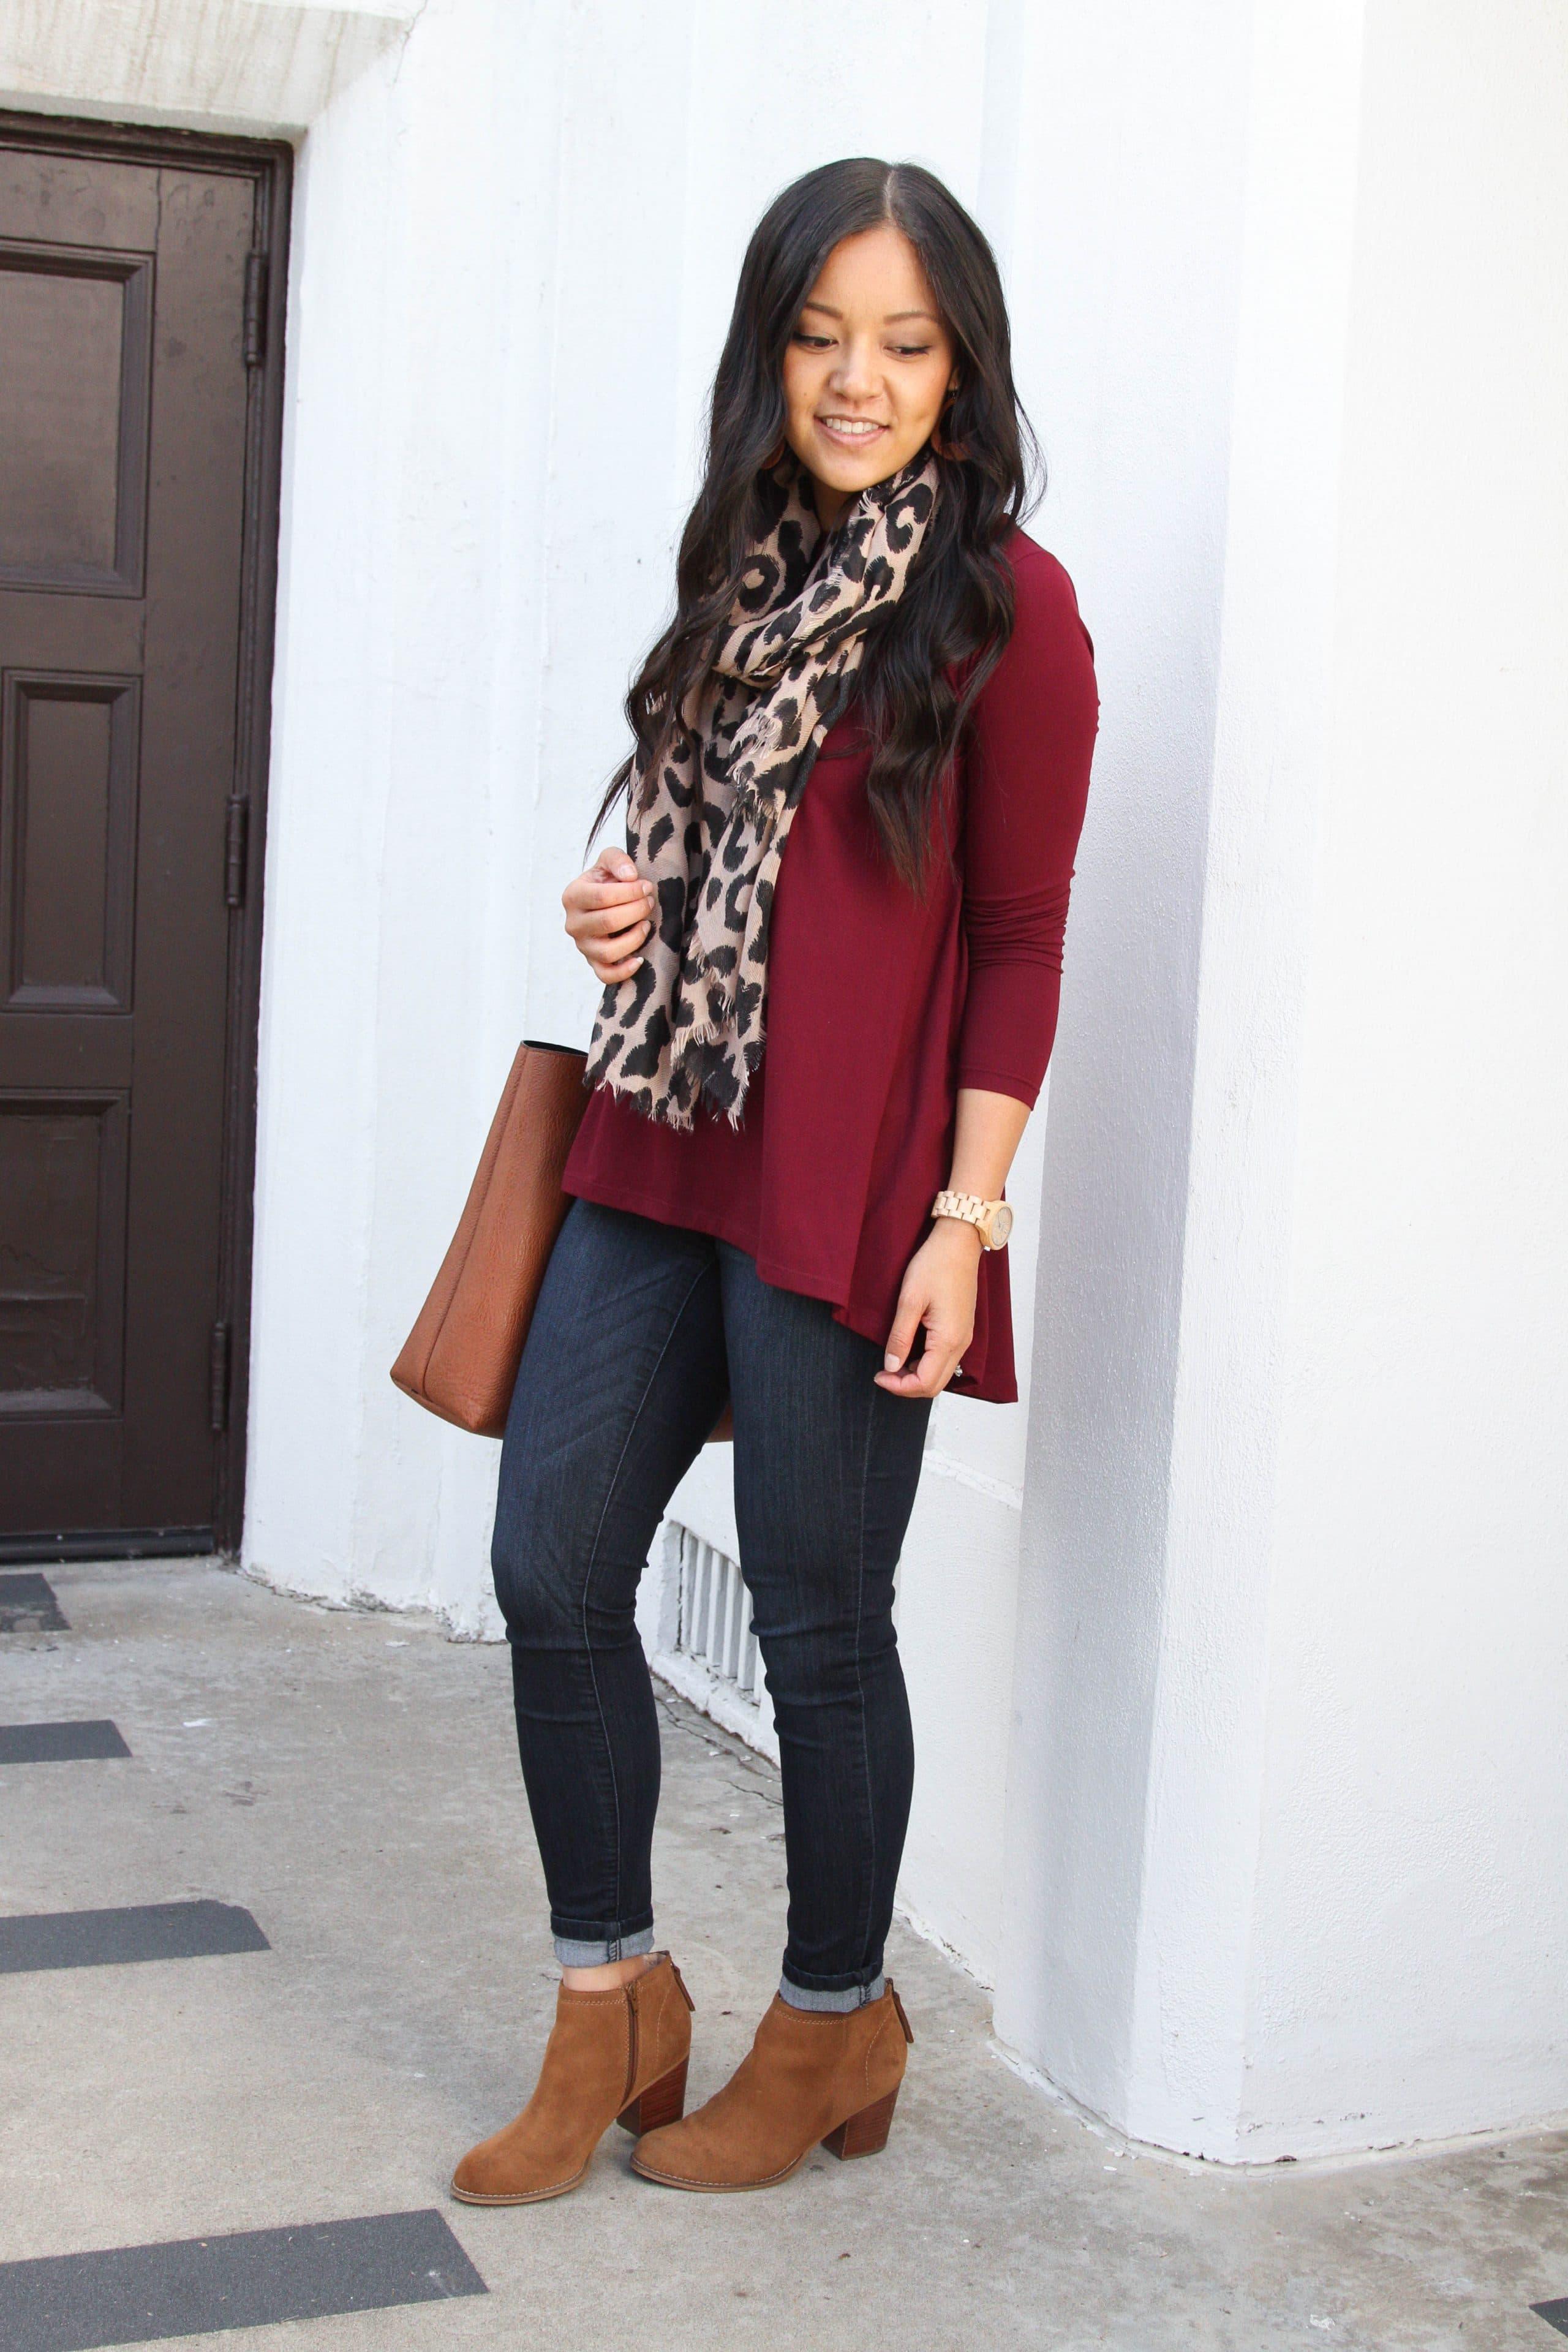 maroon tunic + skinny jeans + leopard scarf